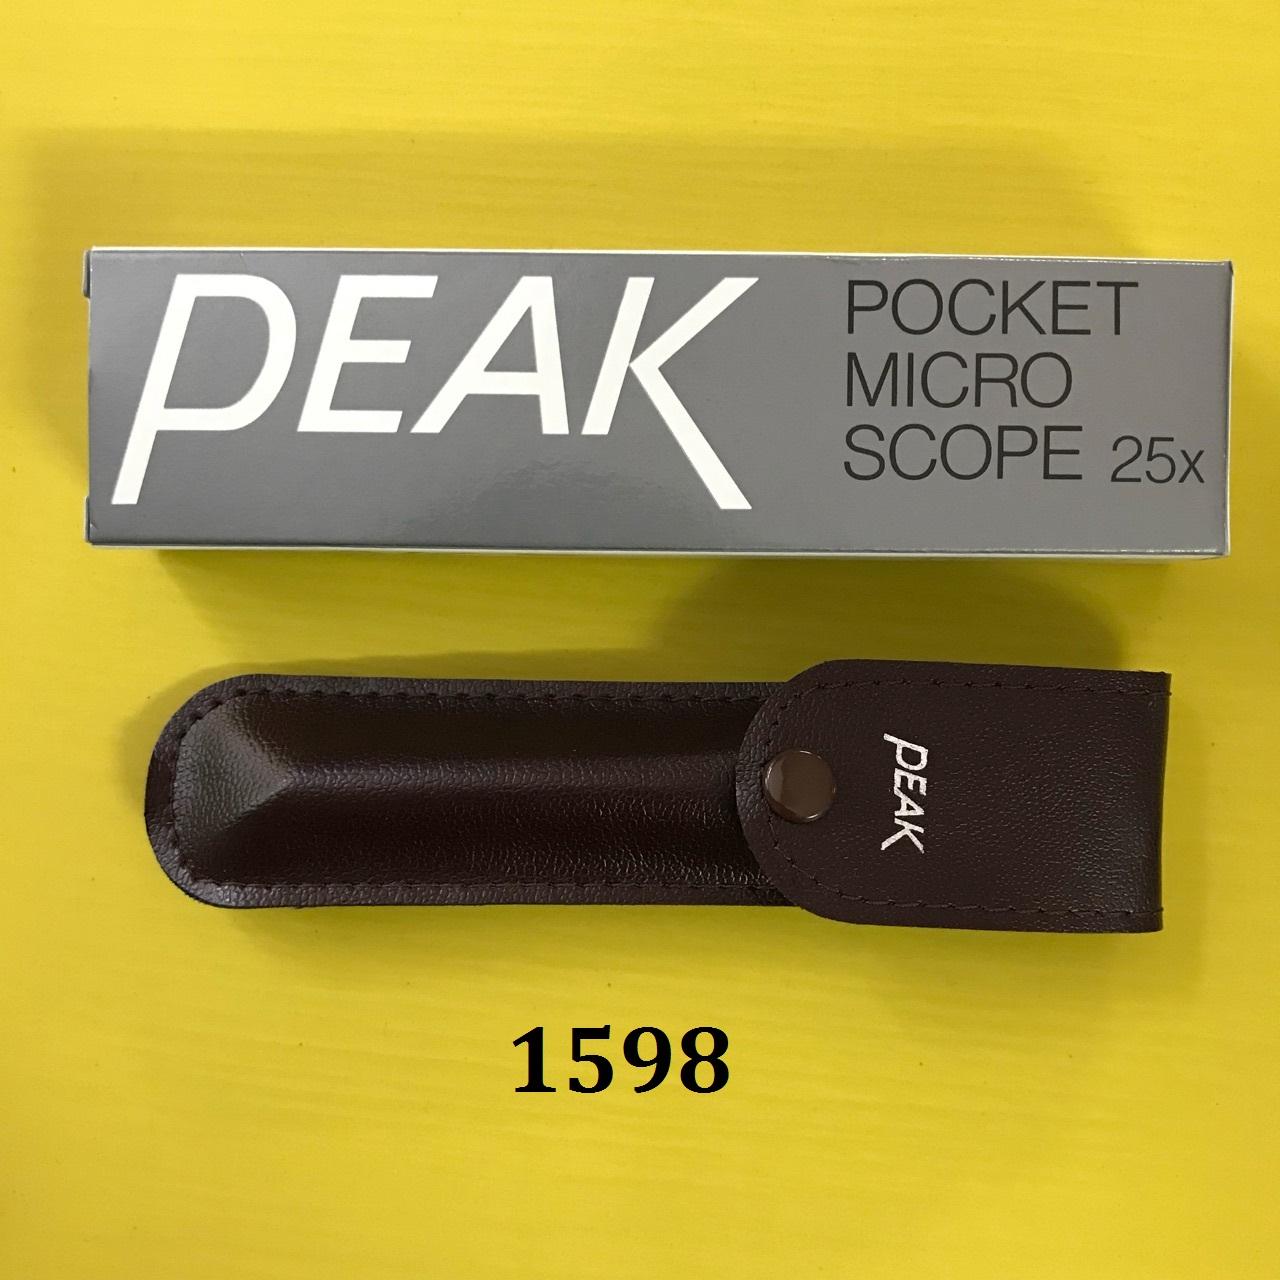 Pocket microscope 2001-25 PEAK